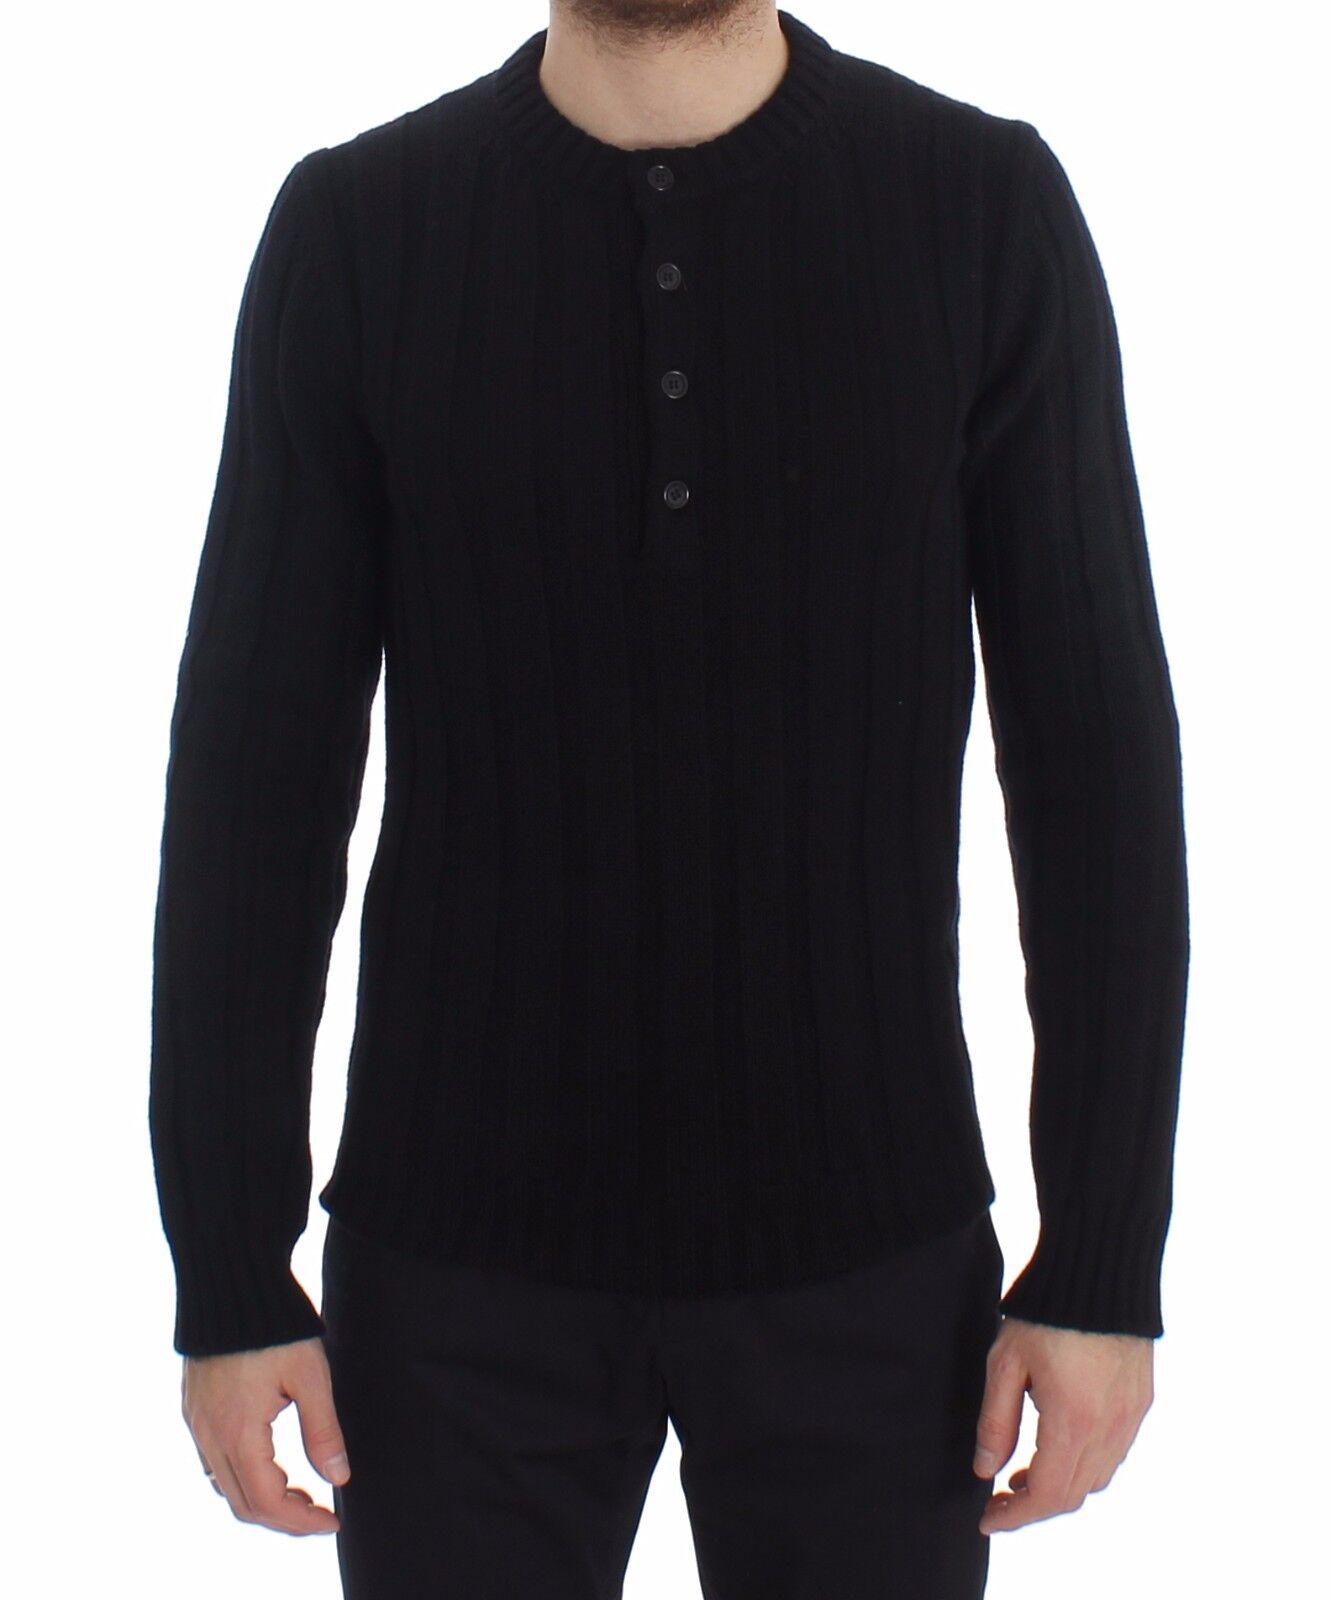 Nuevo Dolce & Gabbana Jersey Cachemira Negro Henley Punto Hombre S. IT52/XL